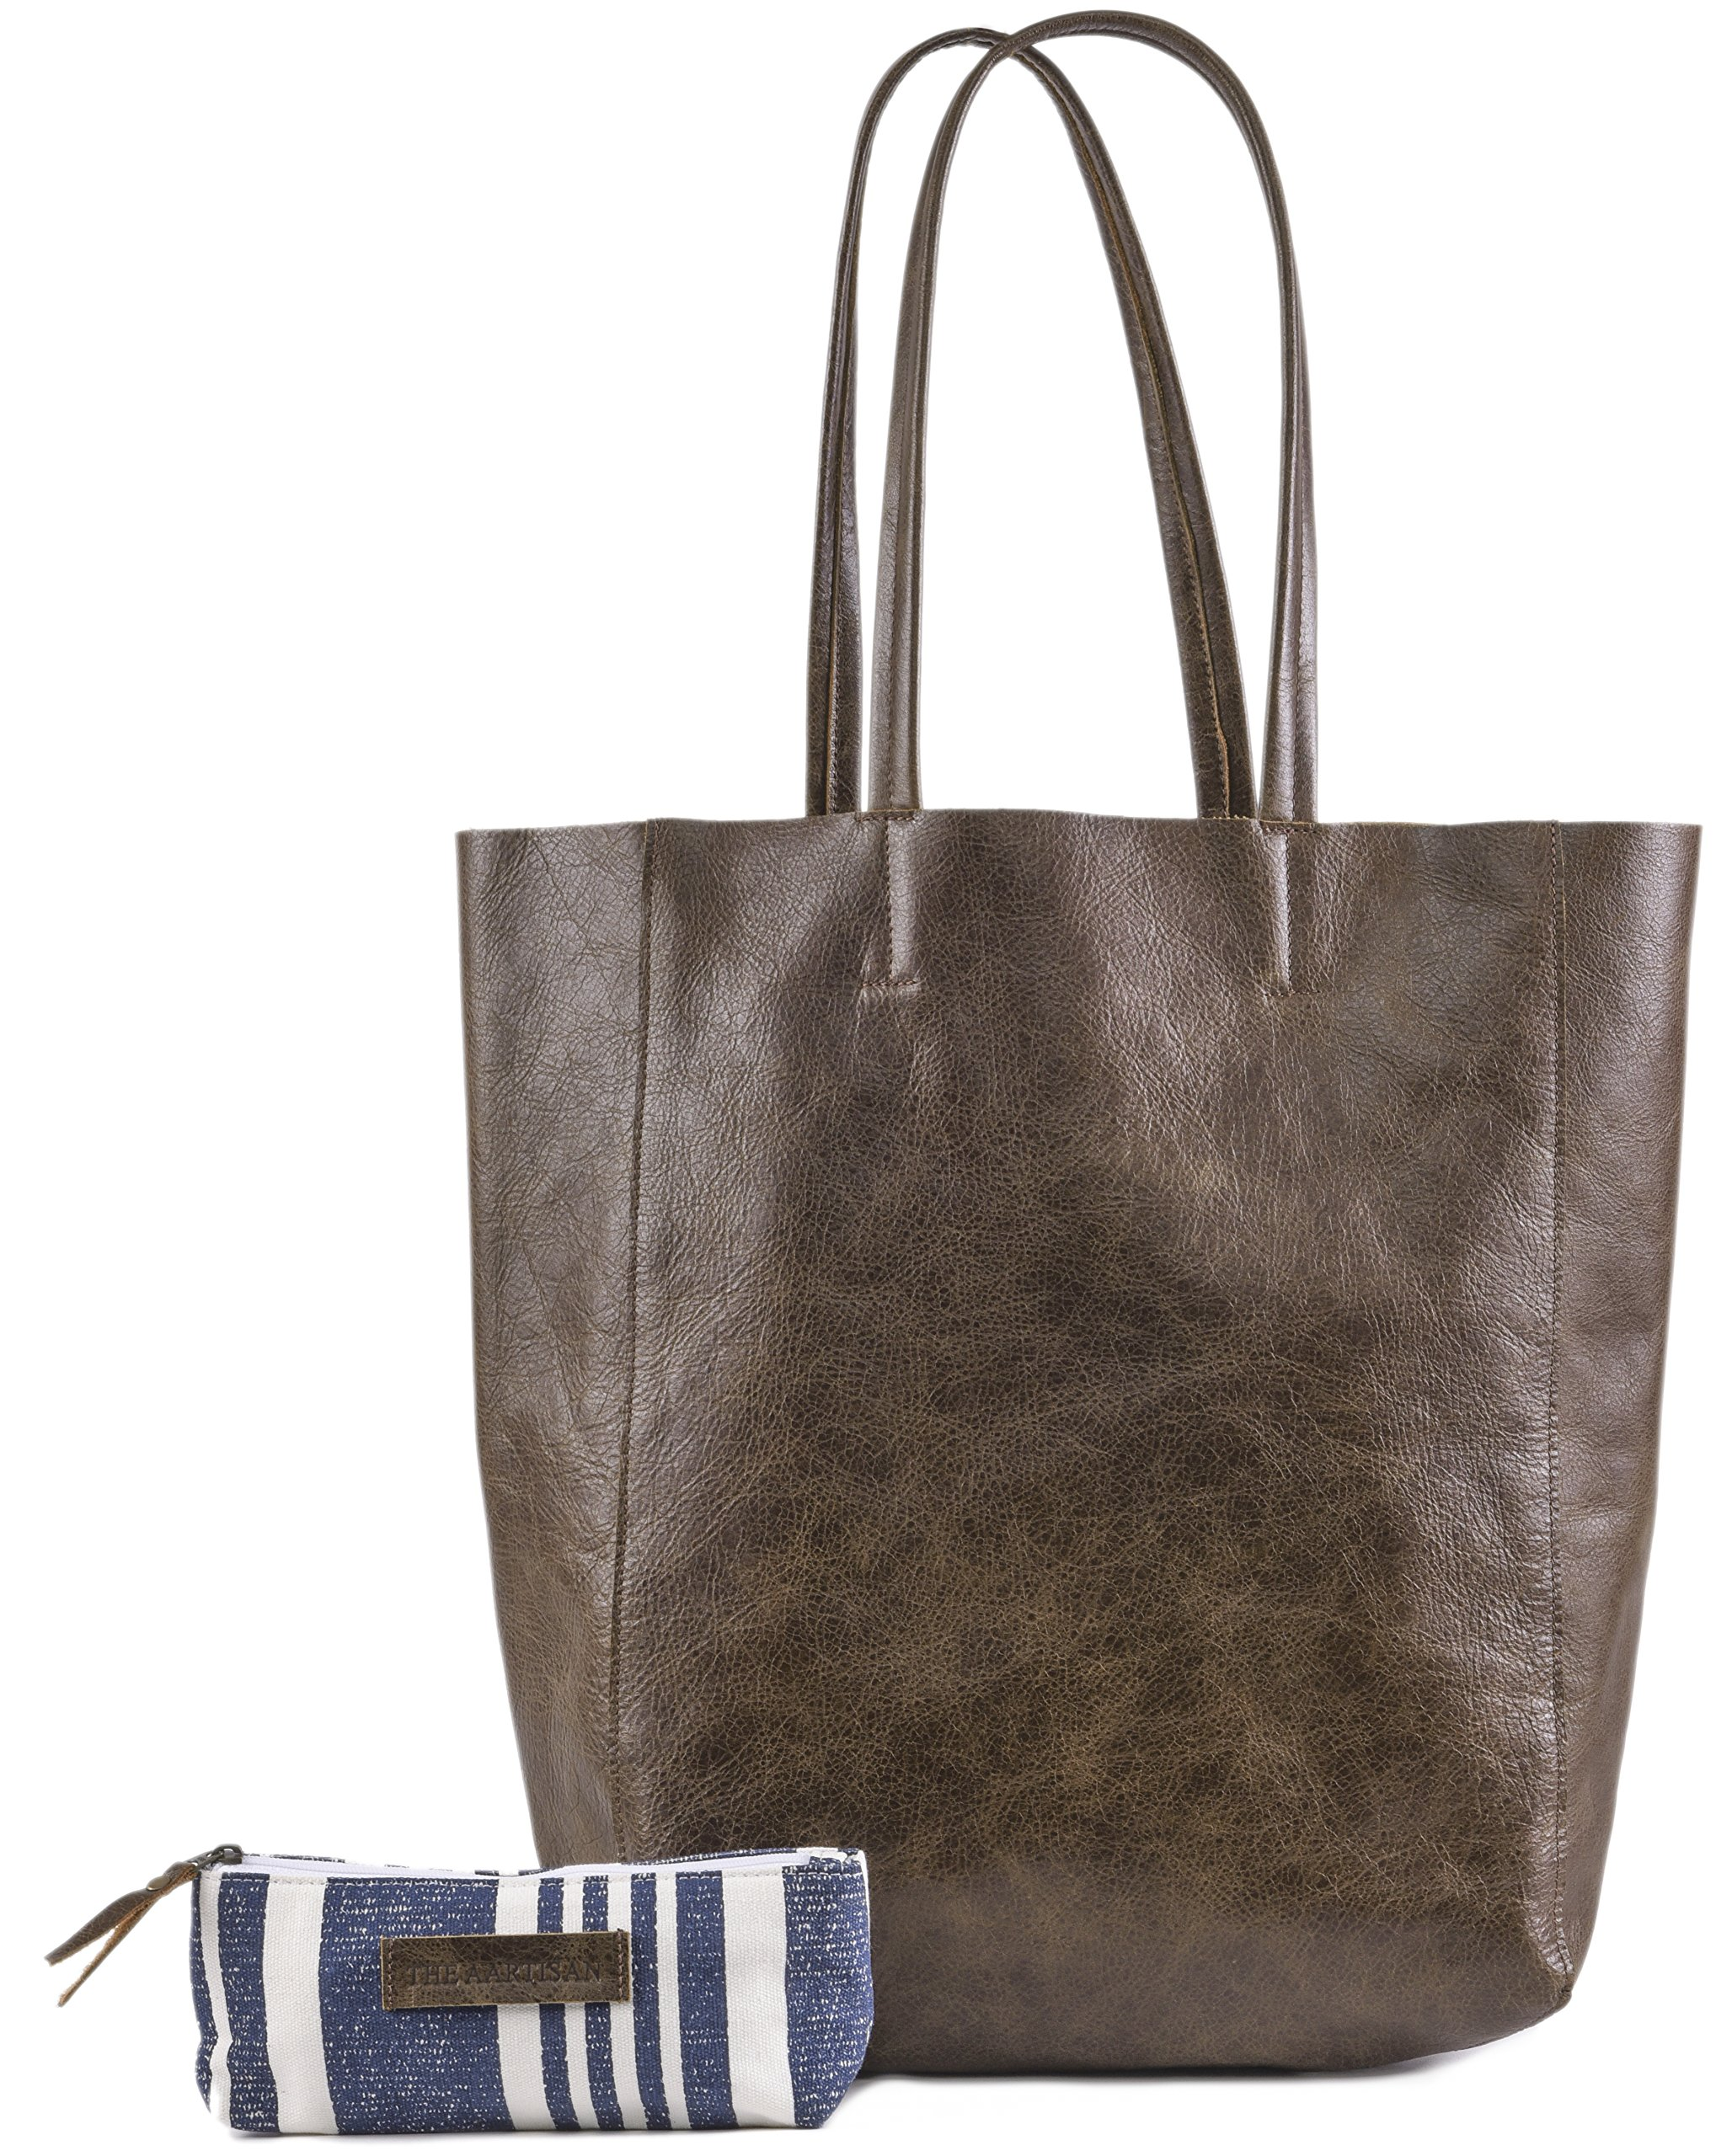 Women's Vintage Genuine Leather Tote Shoulder Bag - Large Capacity Travel Handbag by THE AARTISAN (Image #1)